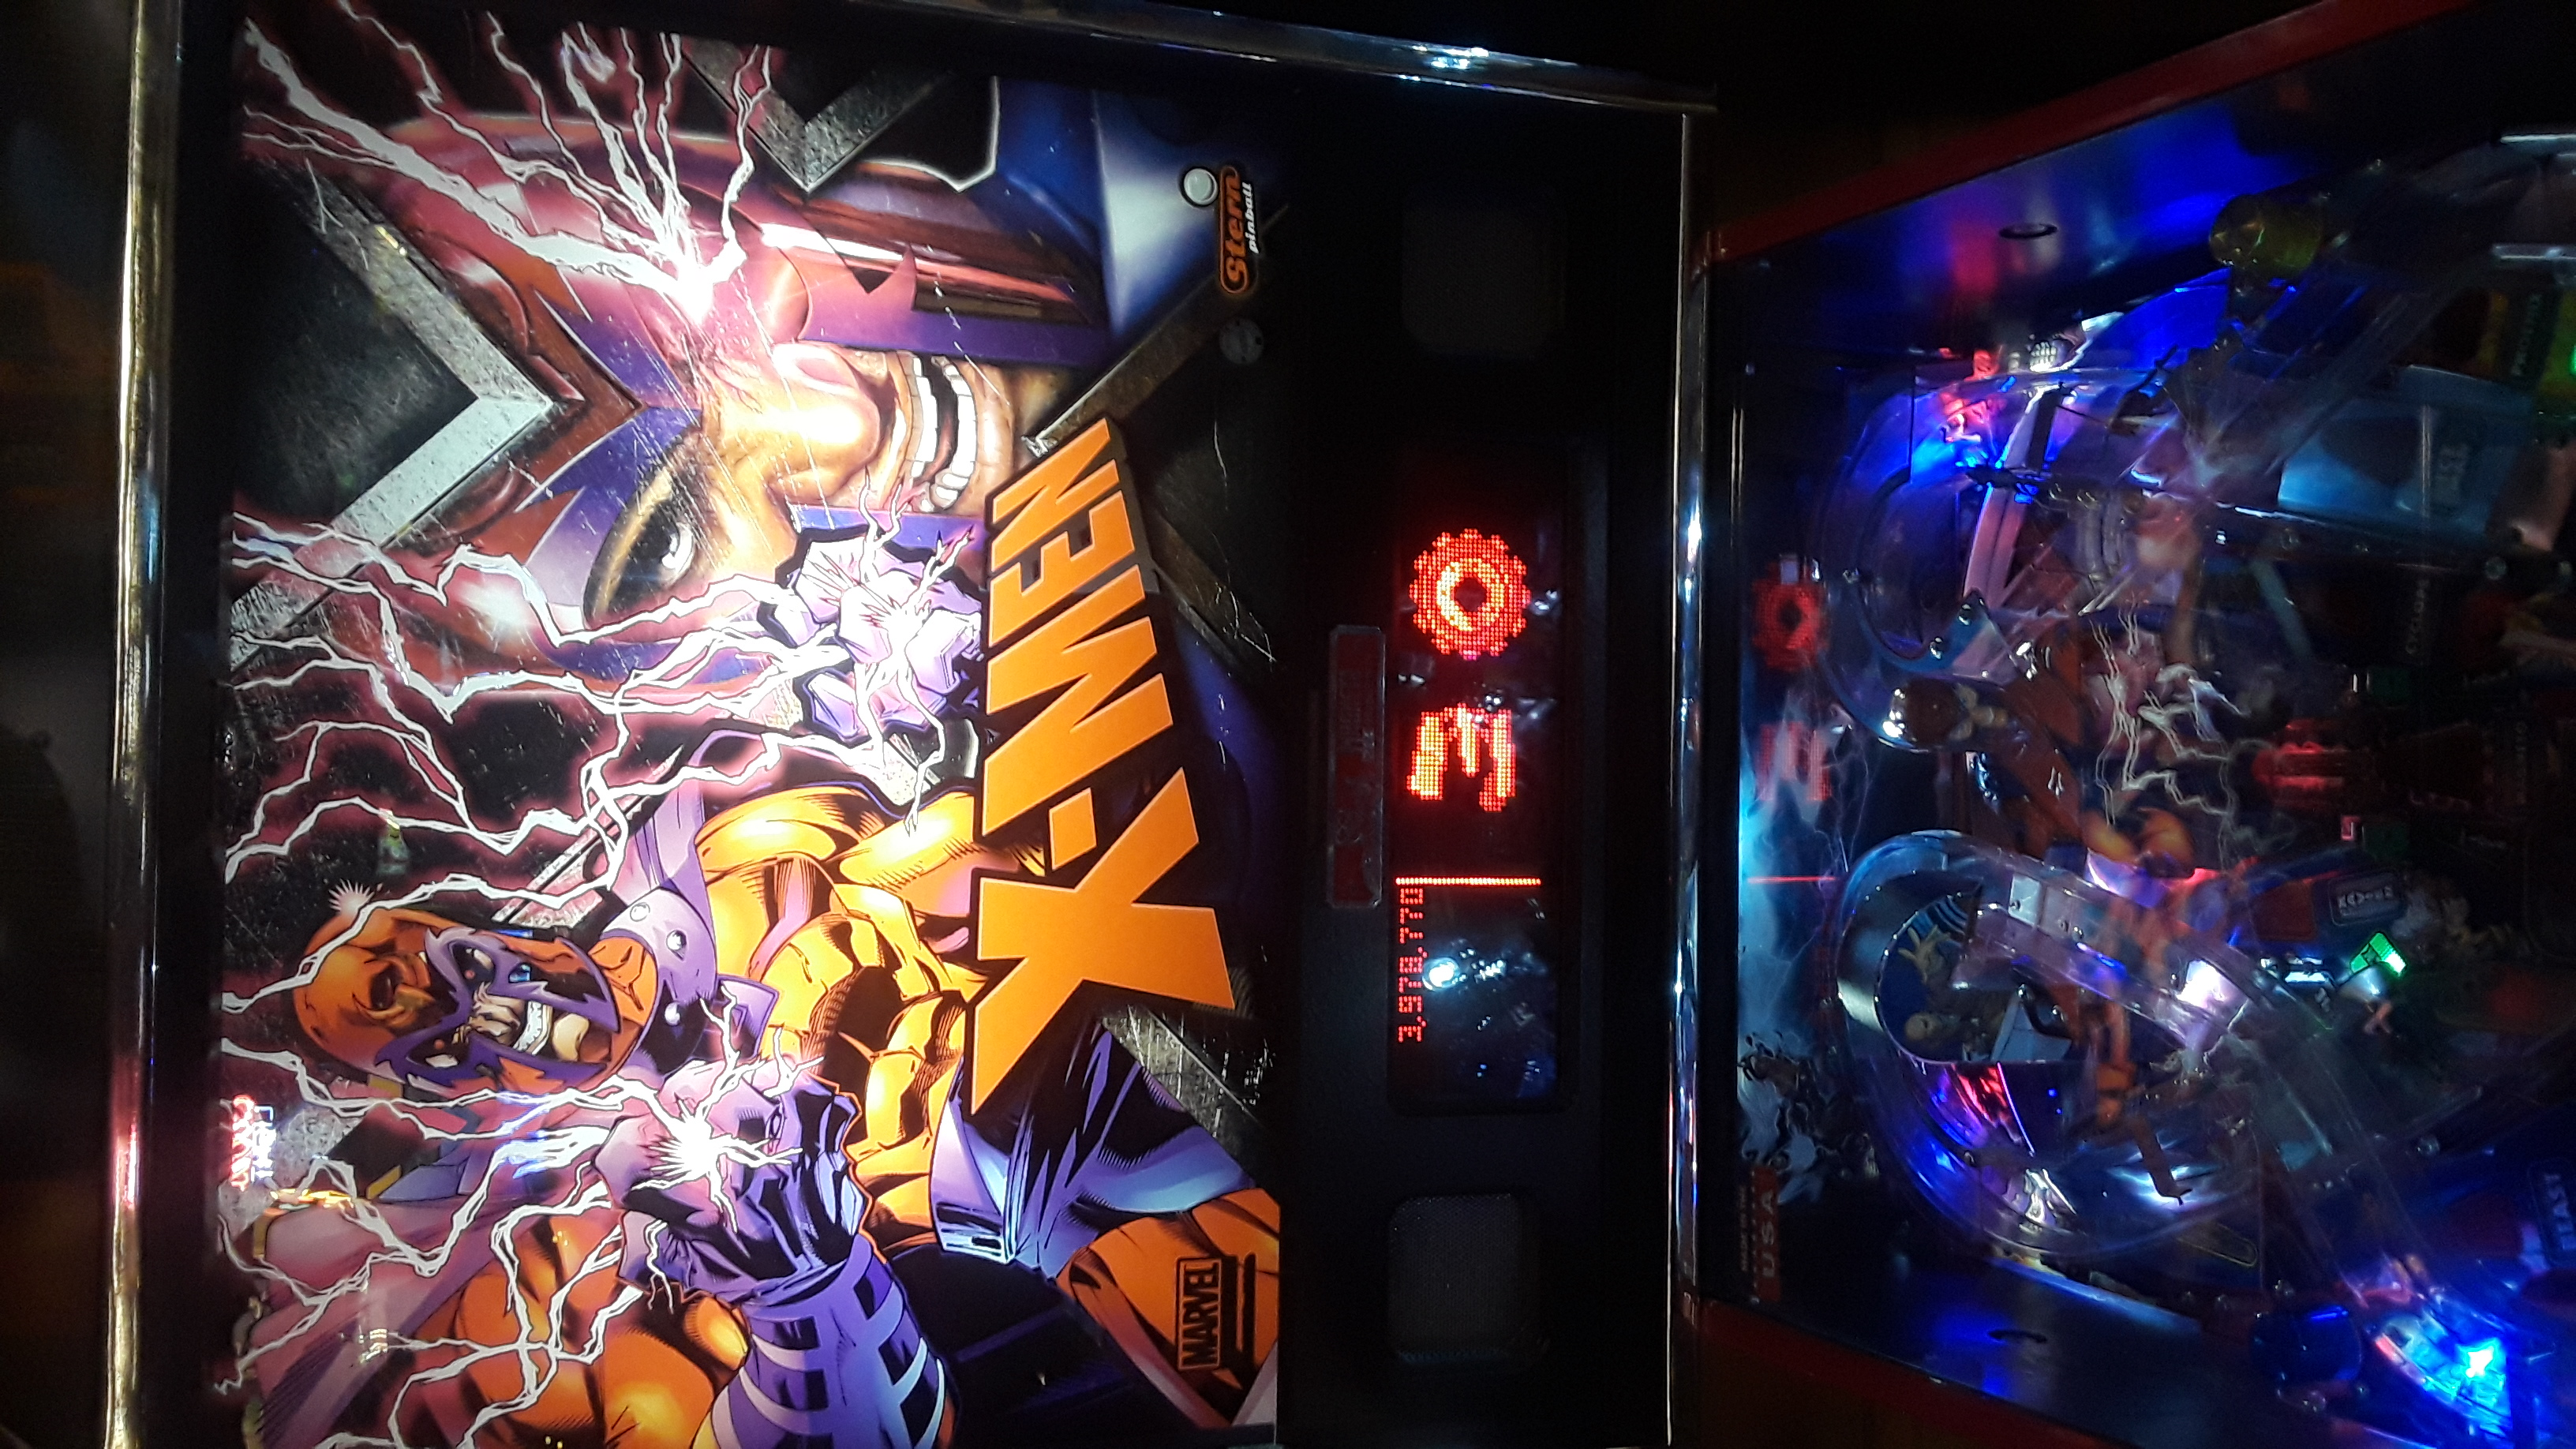 JML101582: X-Men Pro (Pinball: 3 Balls) 3,978,770 points on 2019-12-07 17:16:14